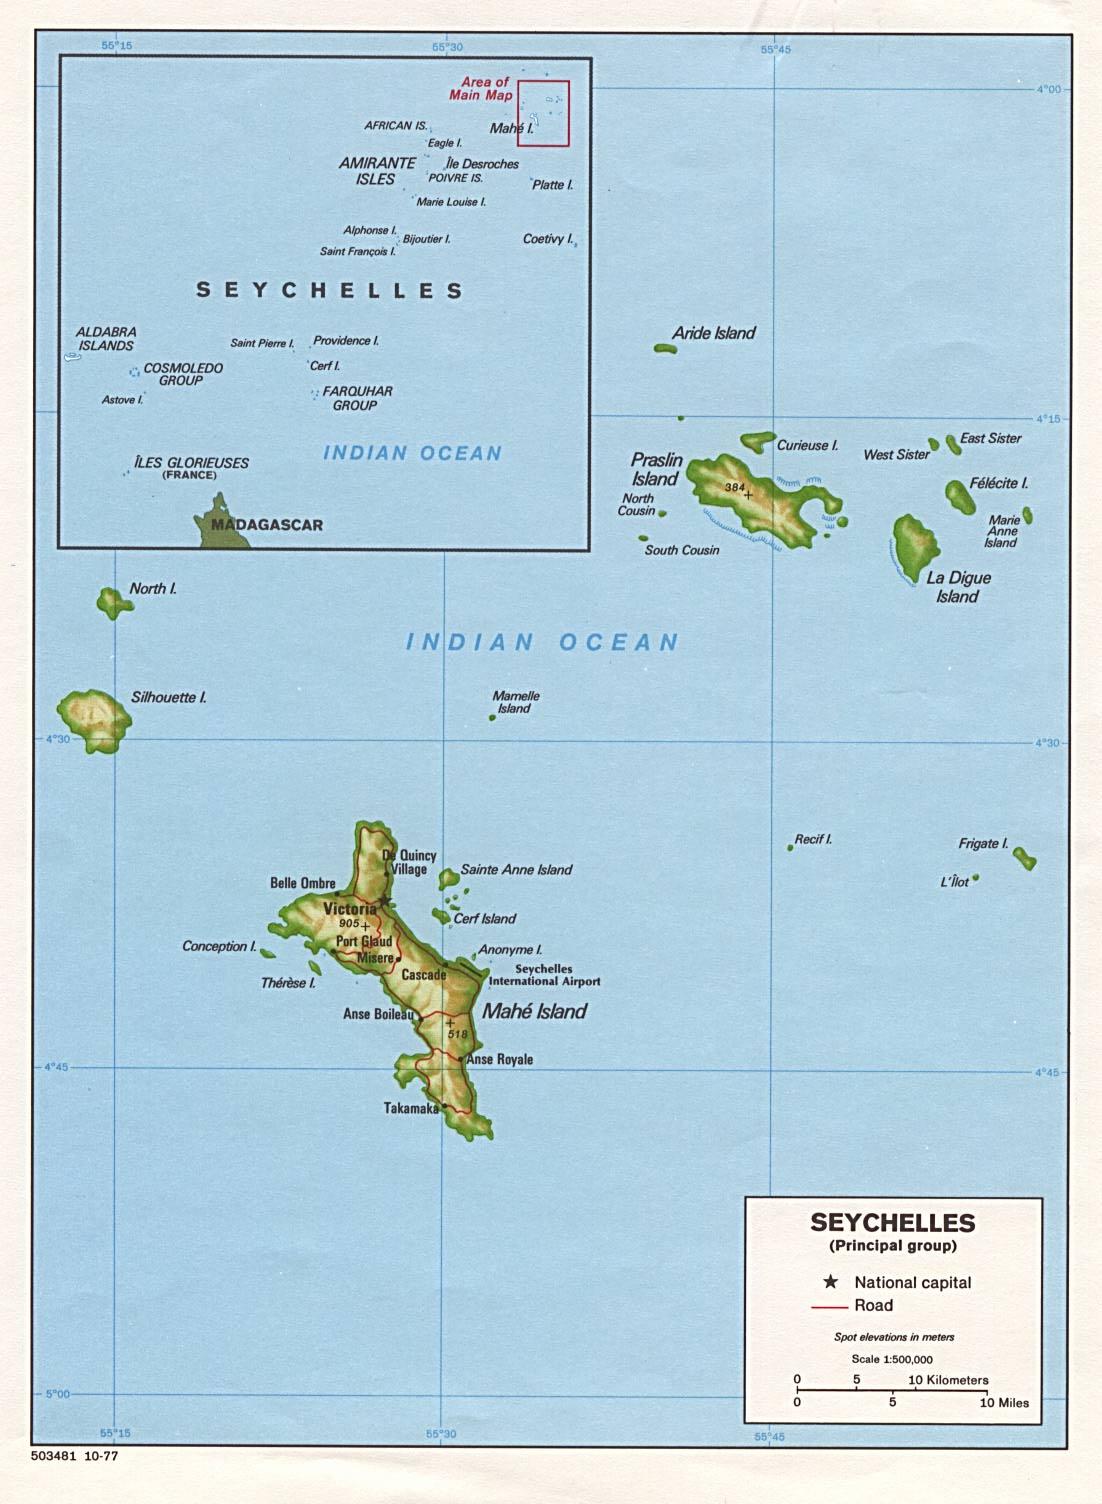 Seychelles | Mapas Geográficos das Ilhas Seychelles